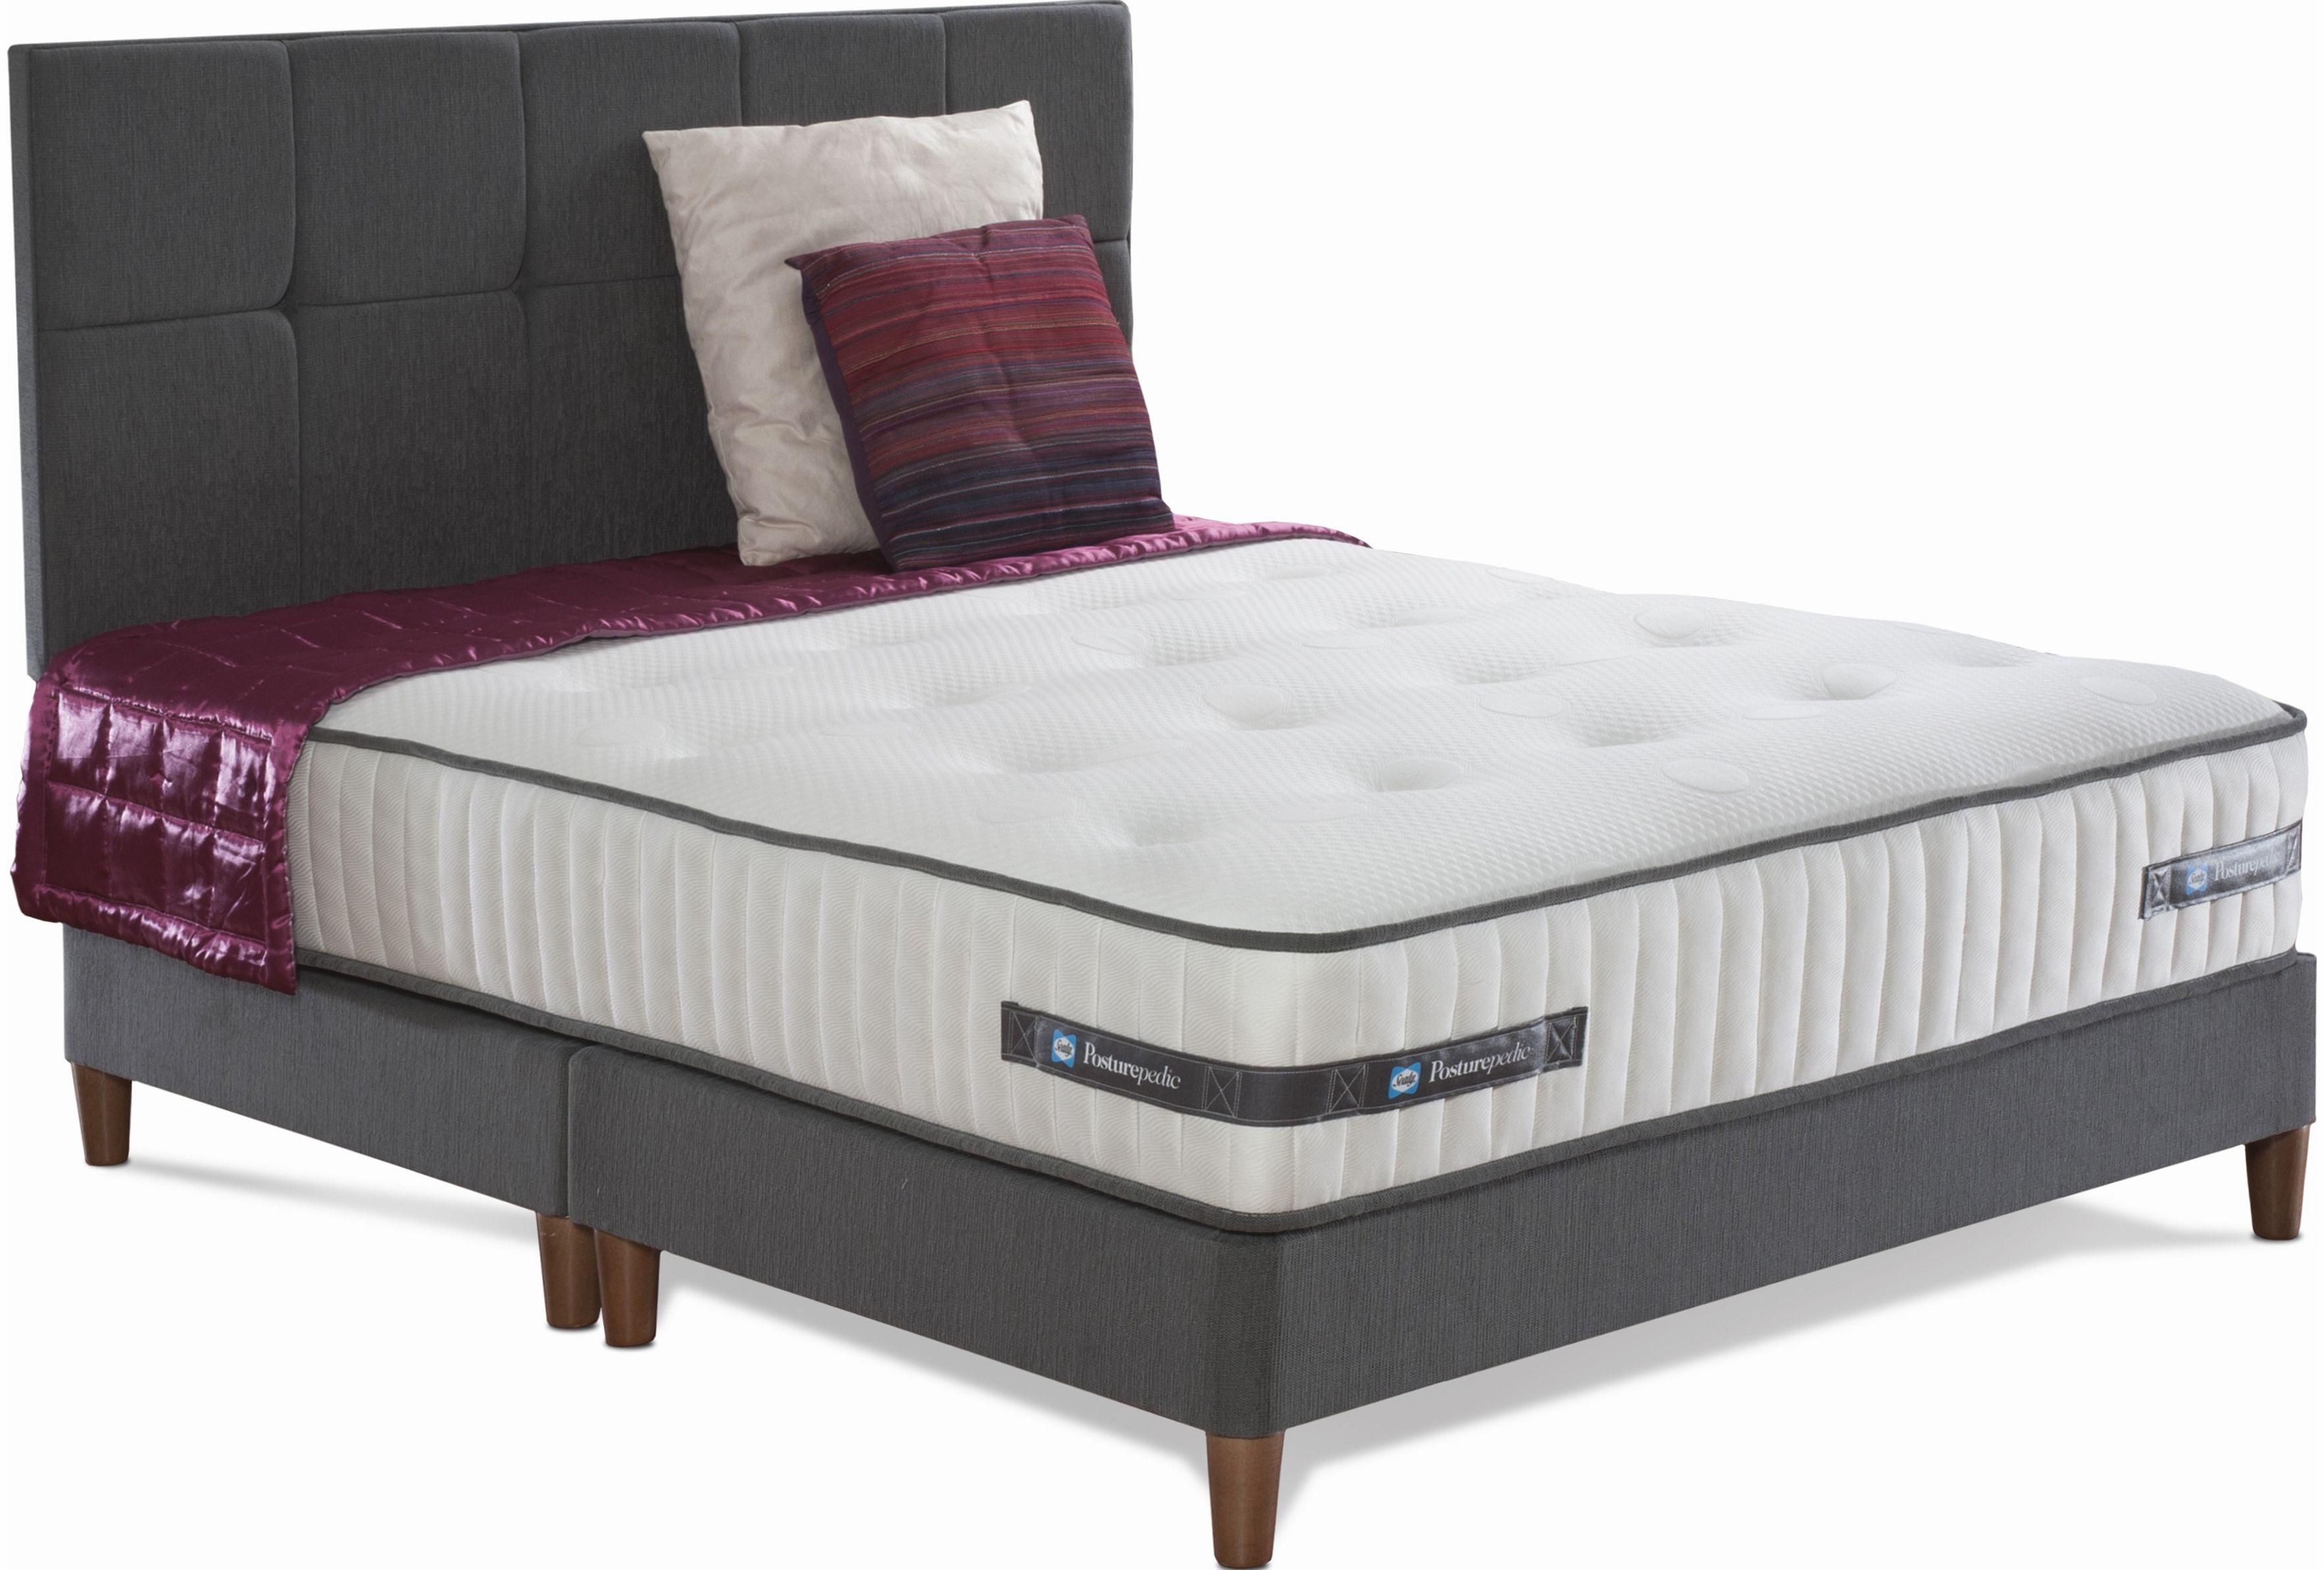 5 0 King Divan Beds